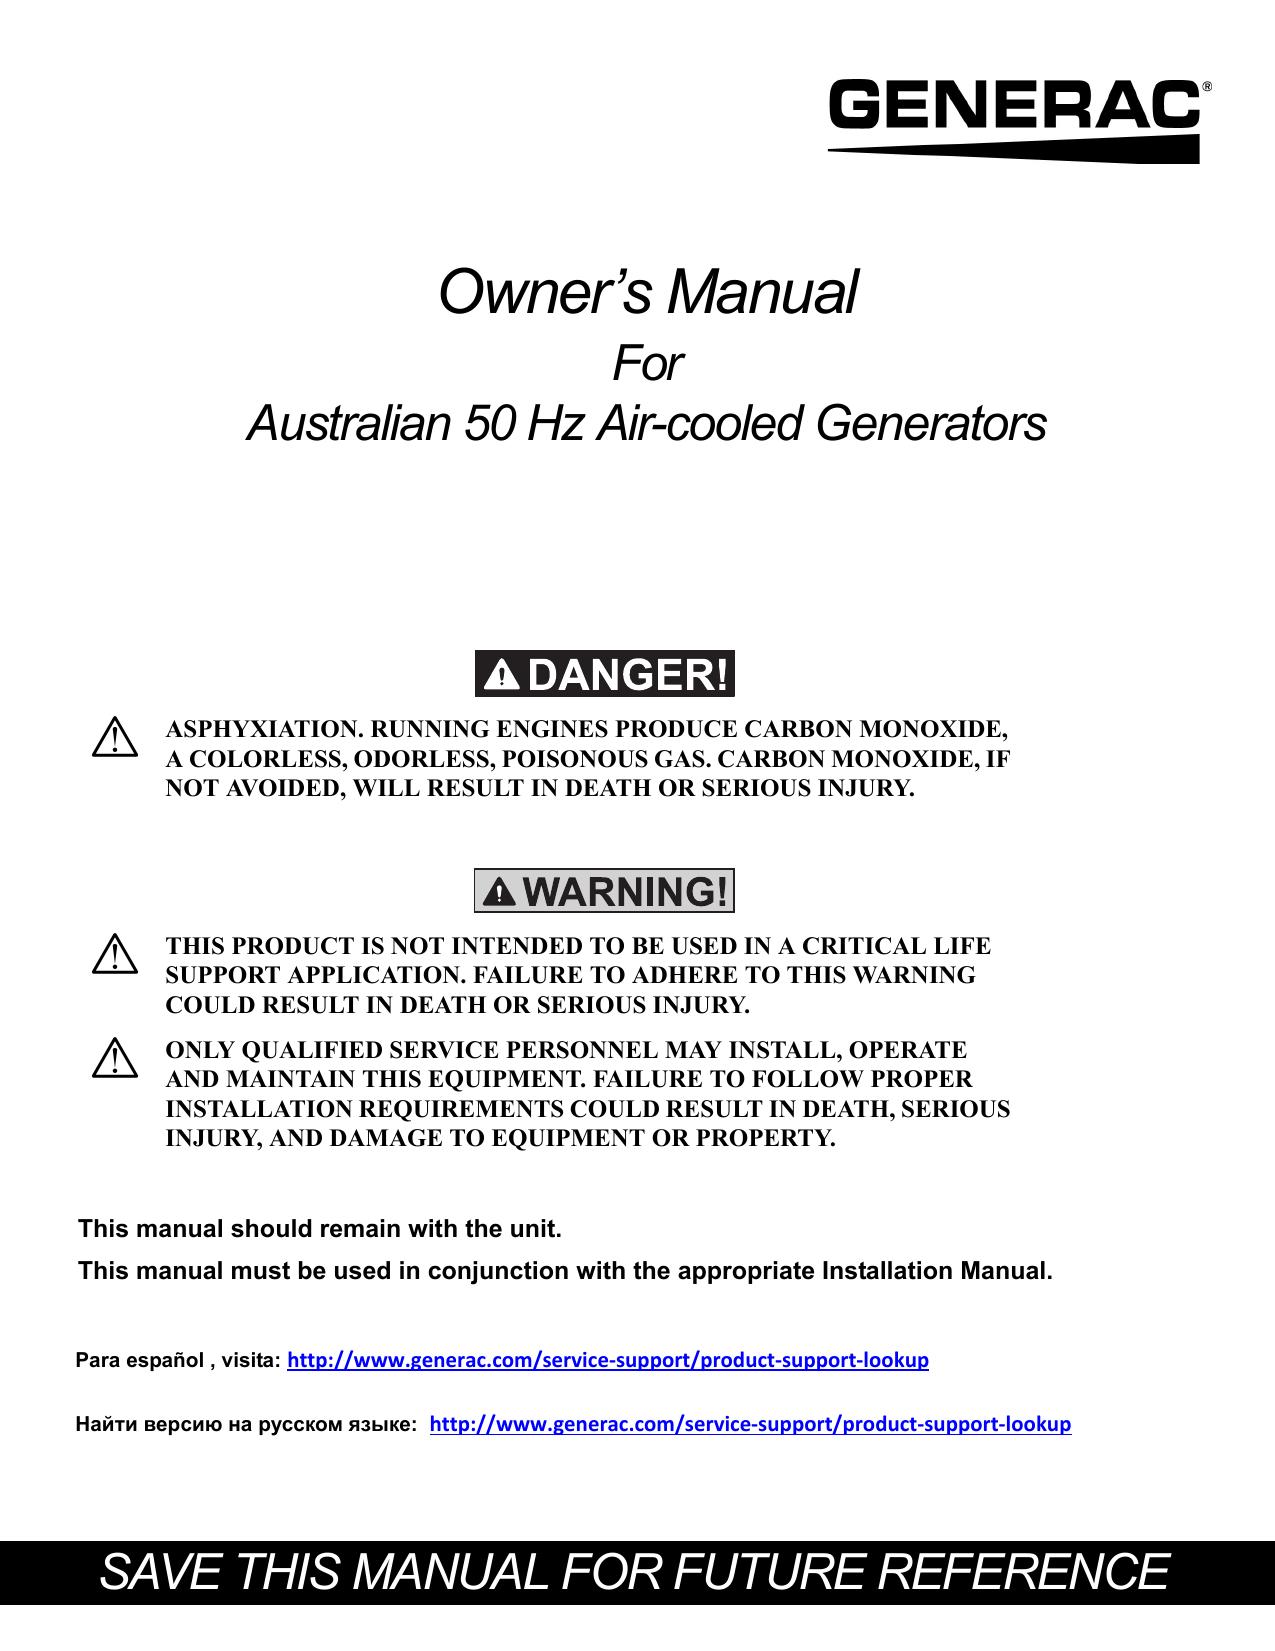 Owner`s Manual For Australian 50 Hz Air-cooled Generators | manualzz com